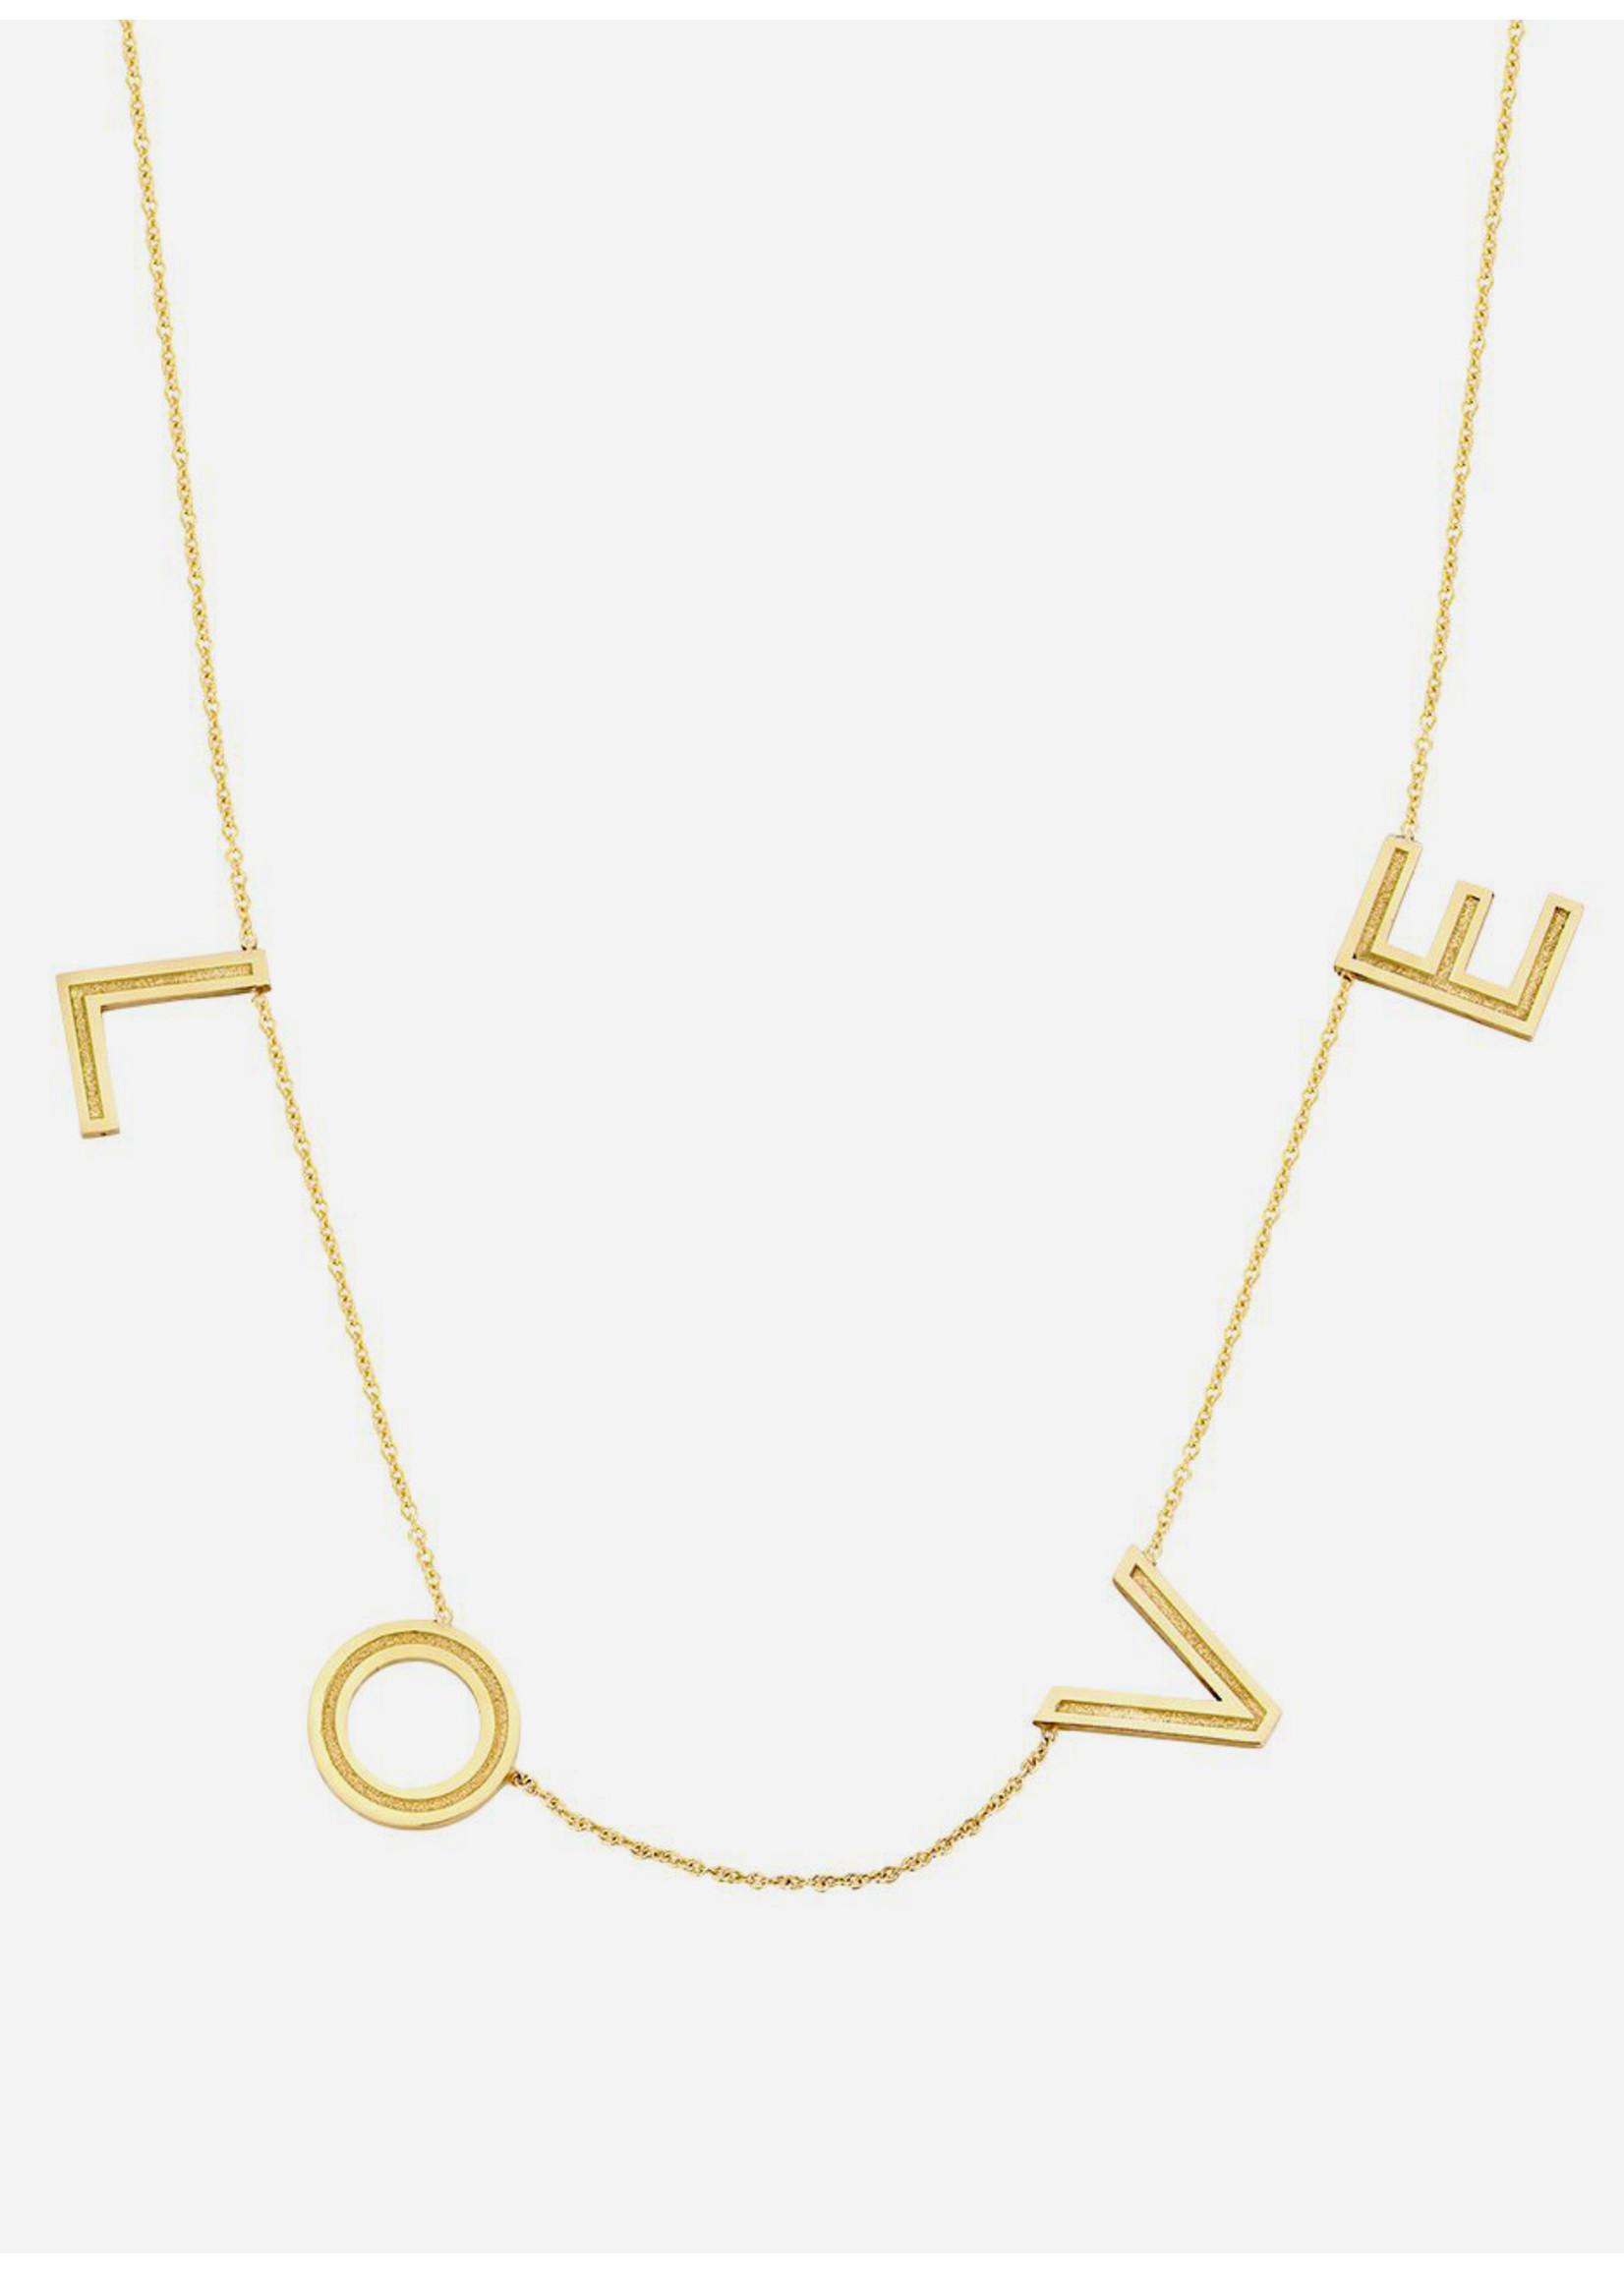 Just Franky Love Letter Big necklace 4 letters